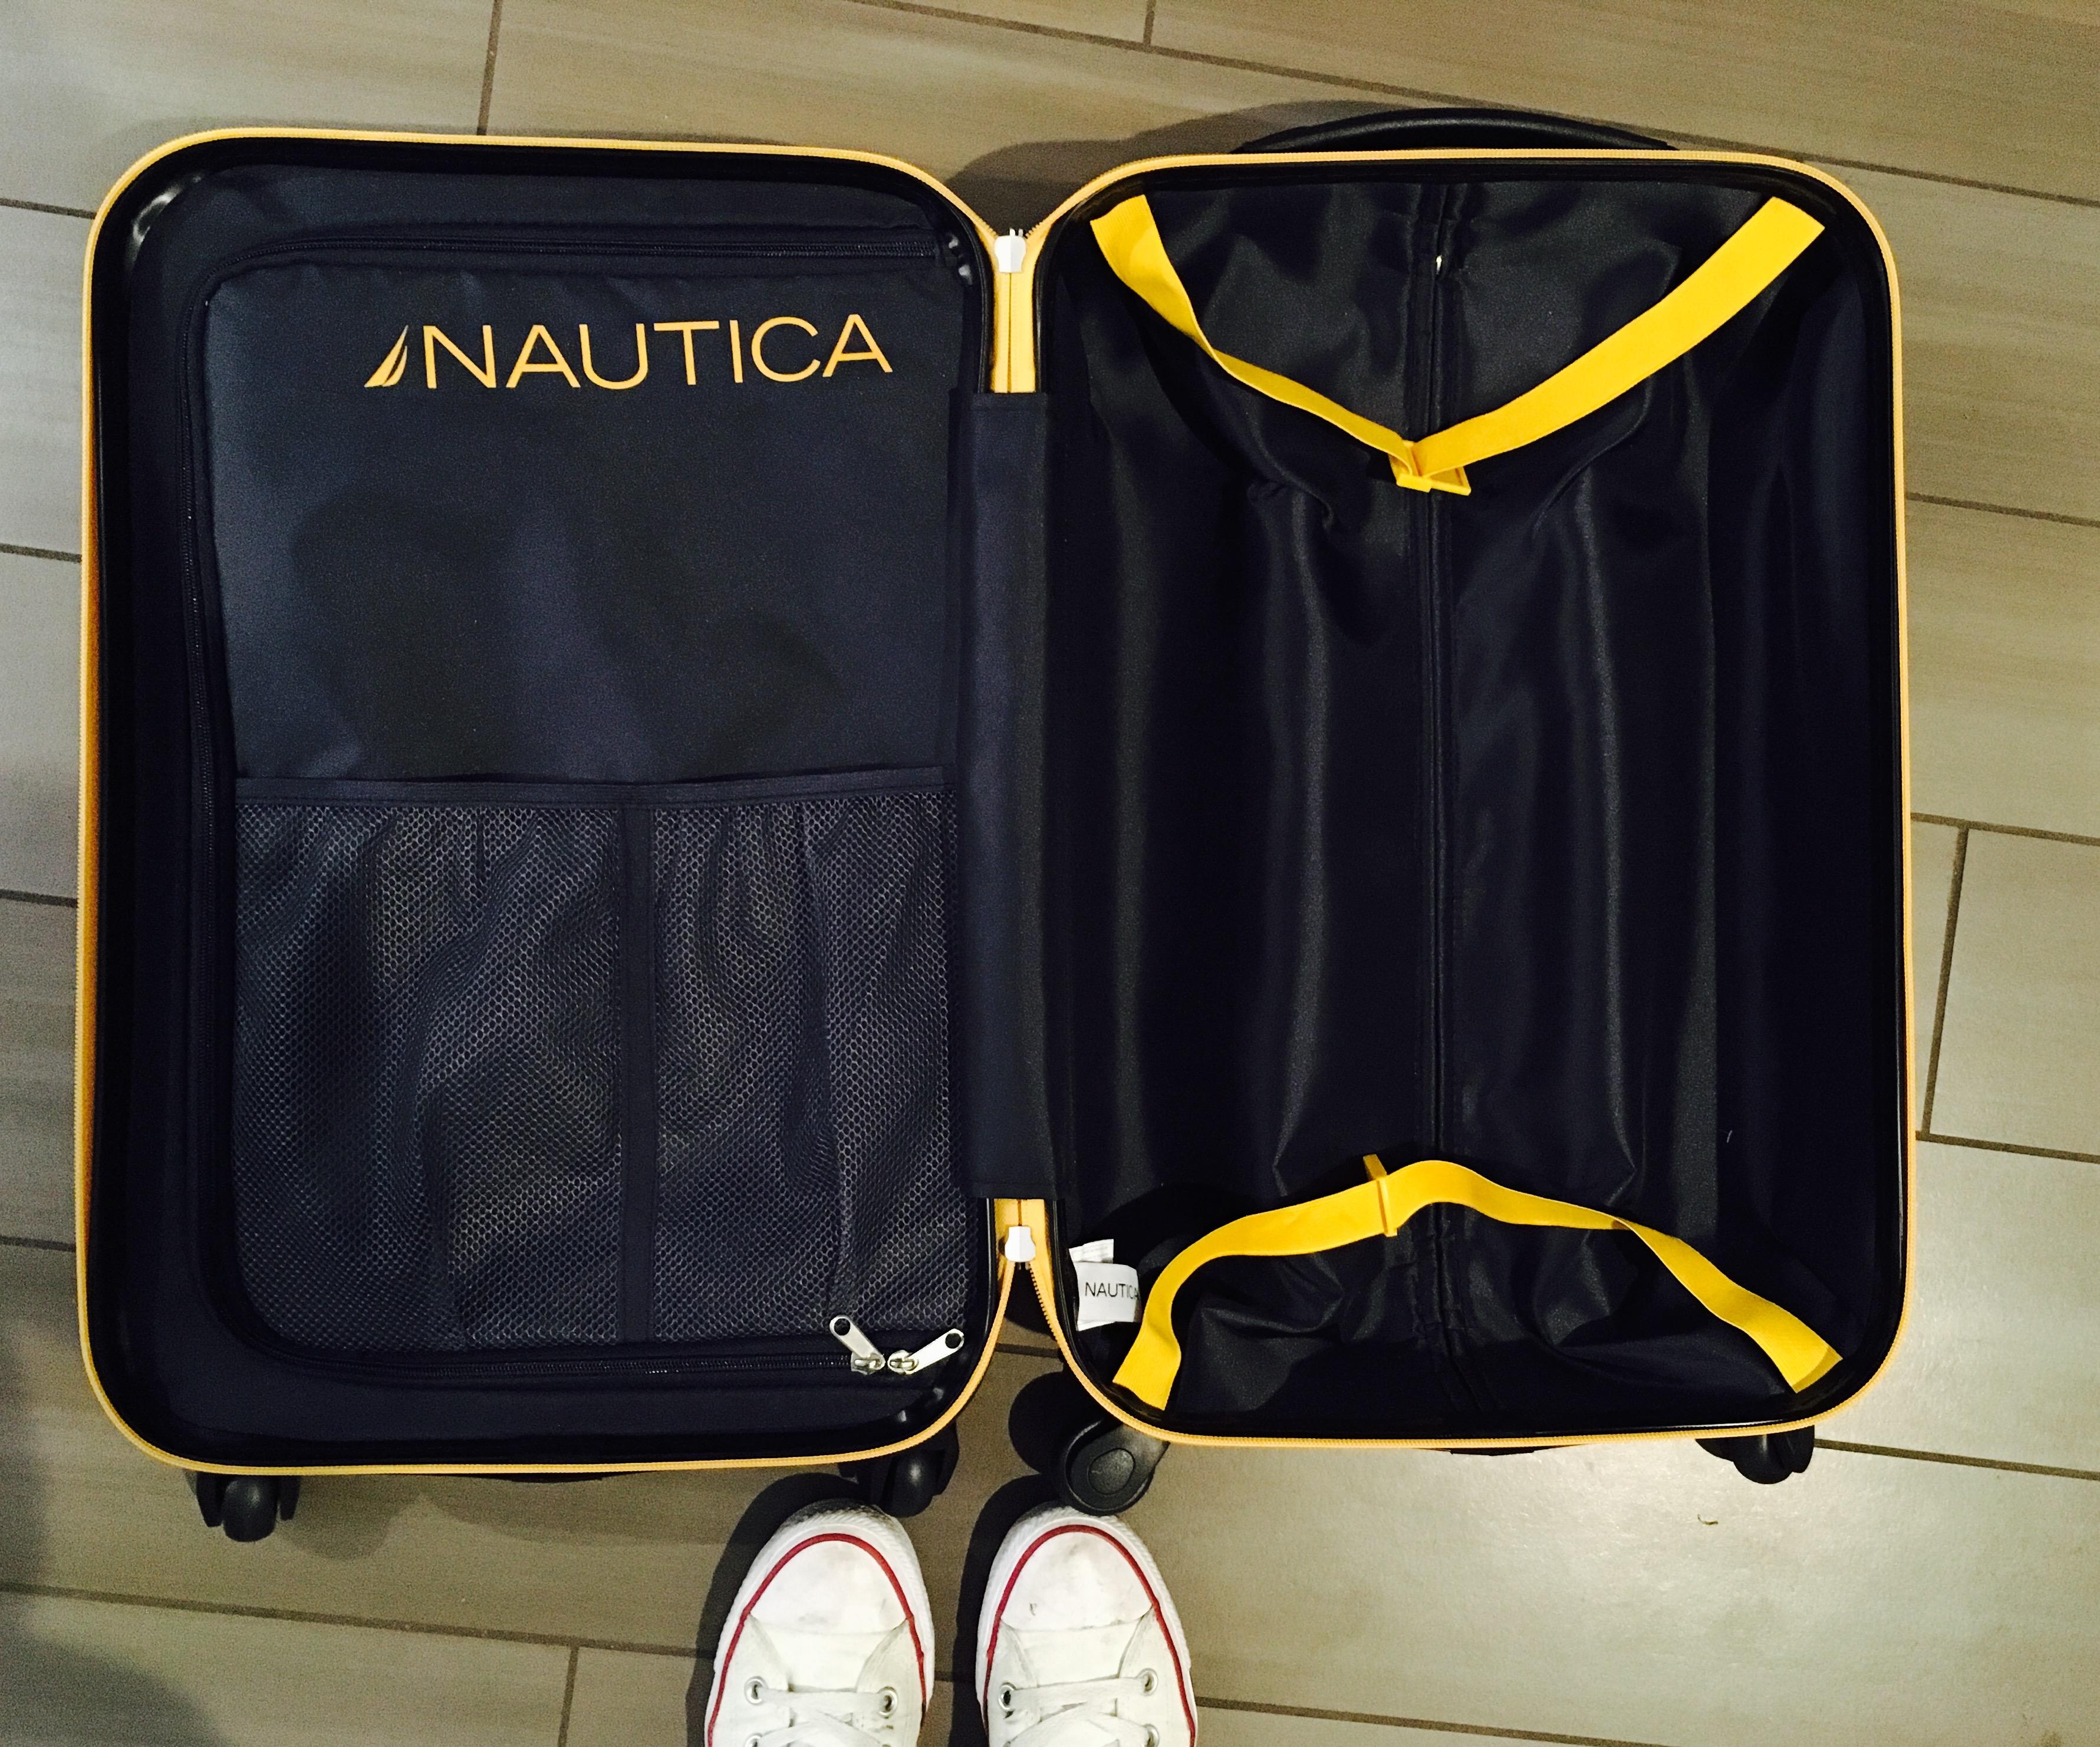 NauticaAhoyUnpacked